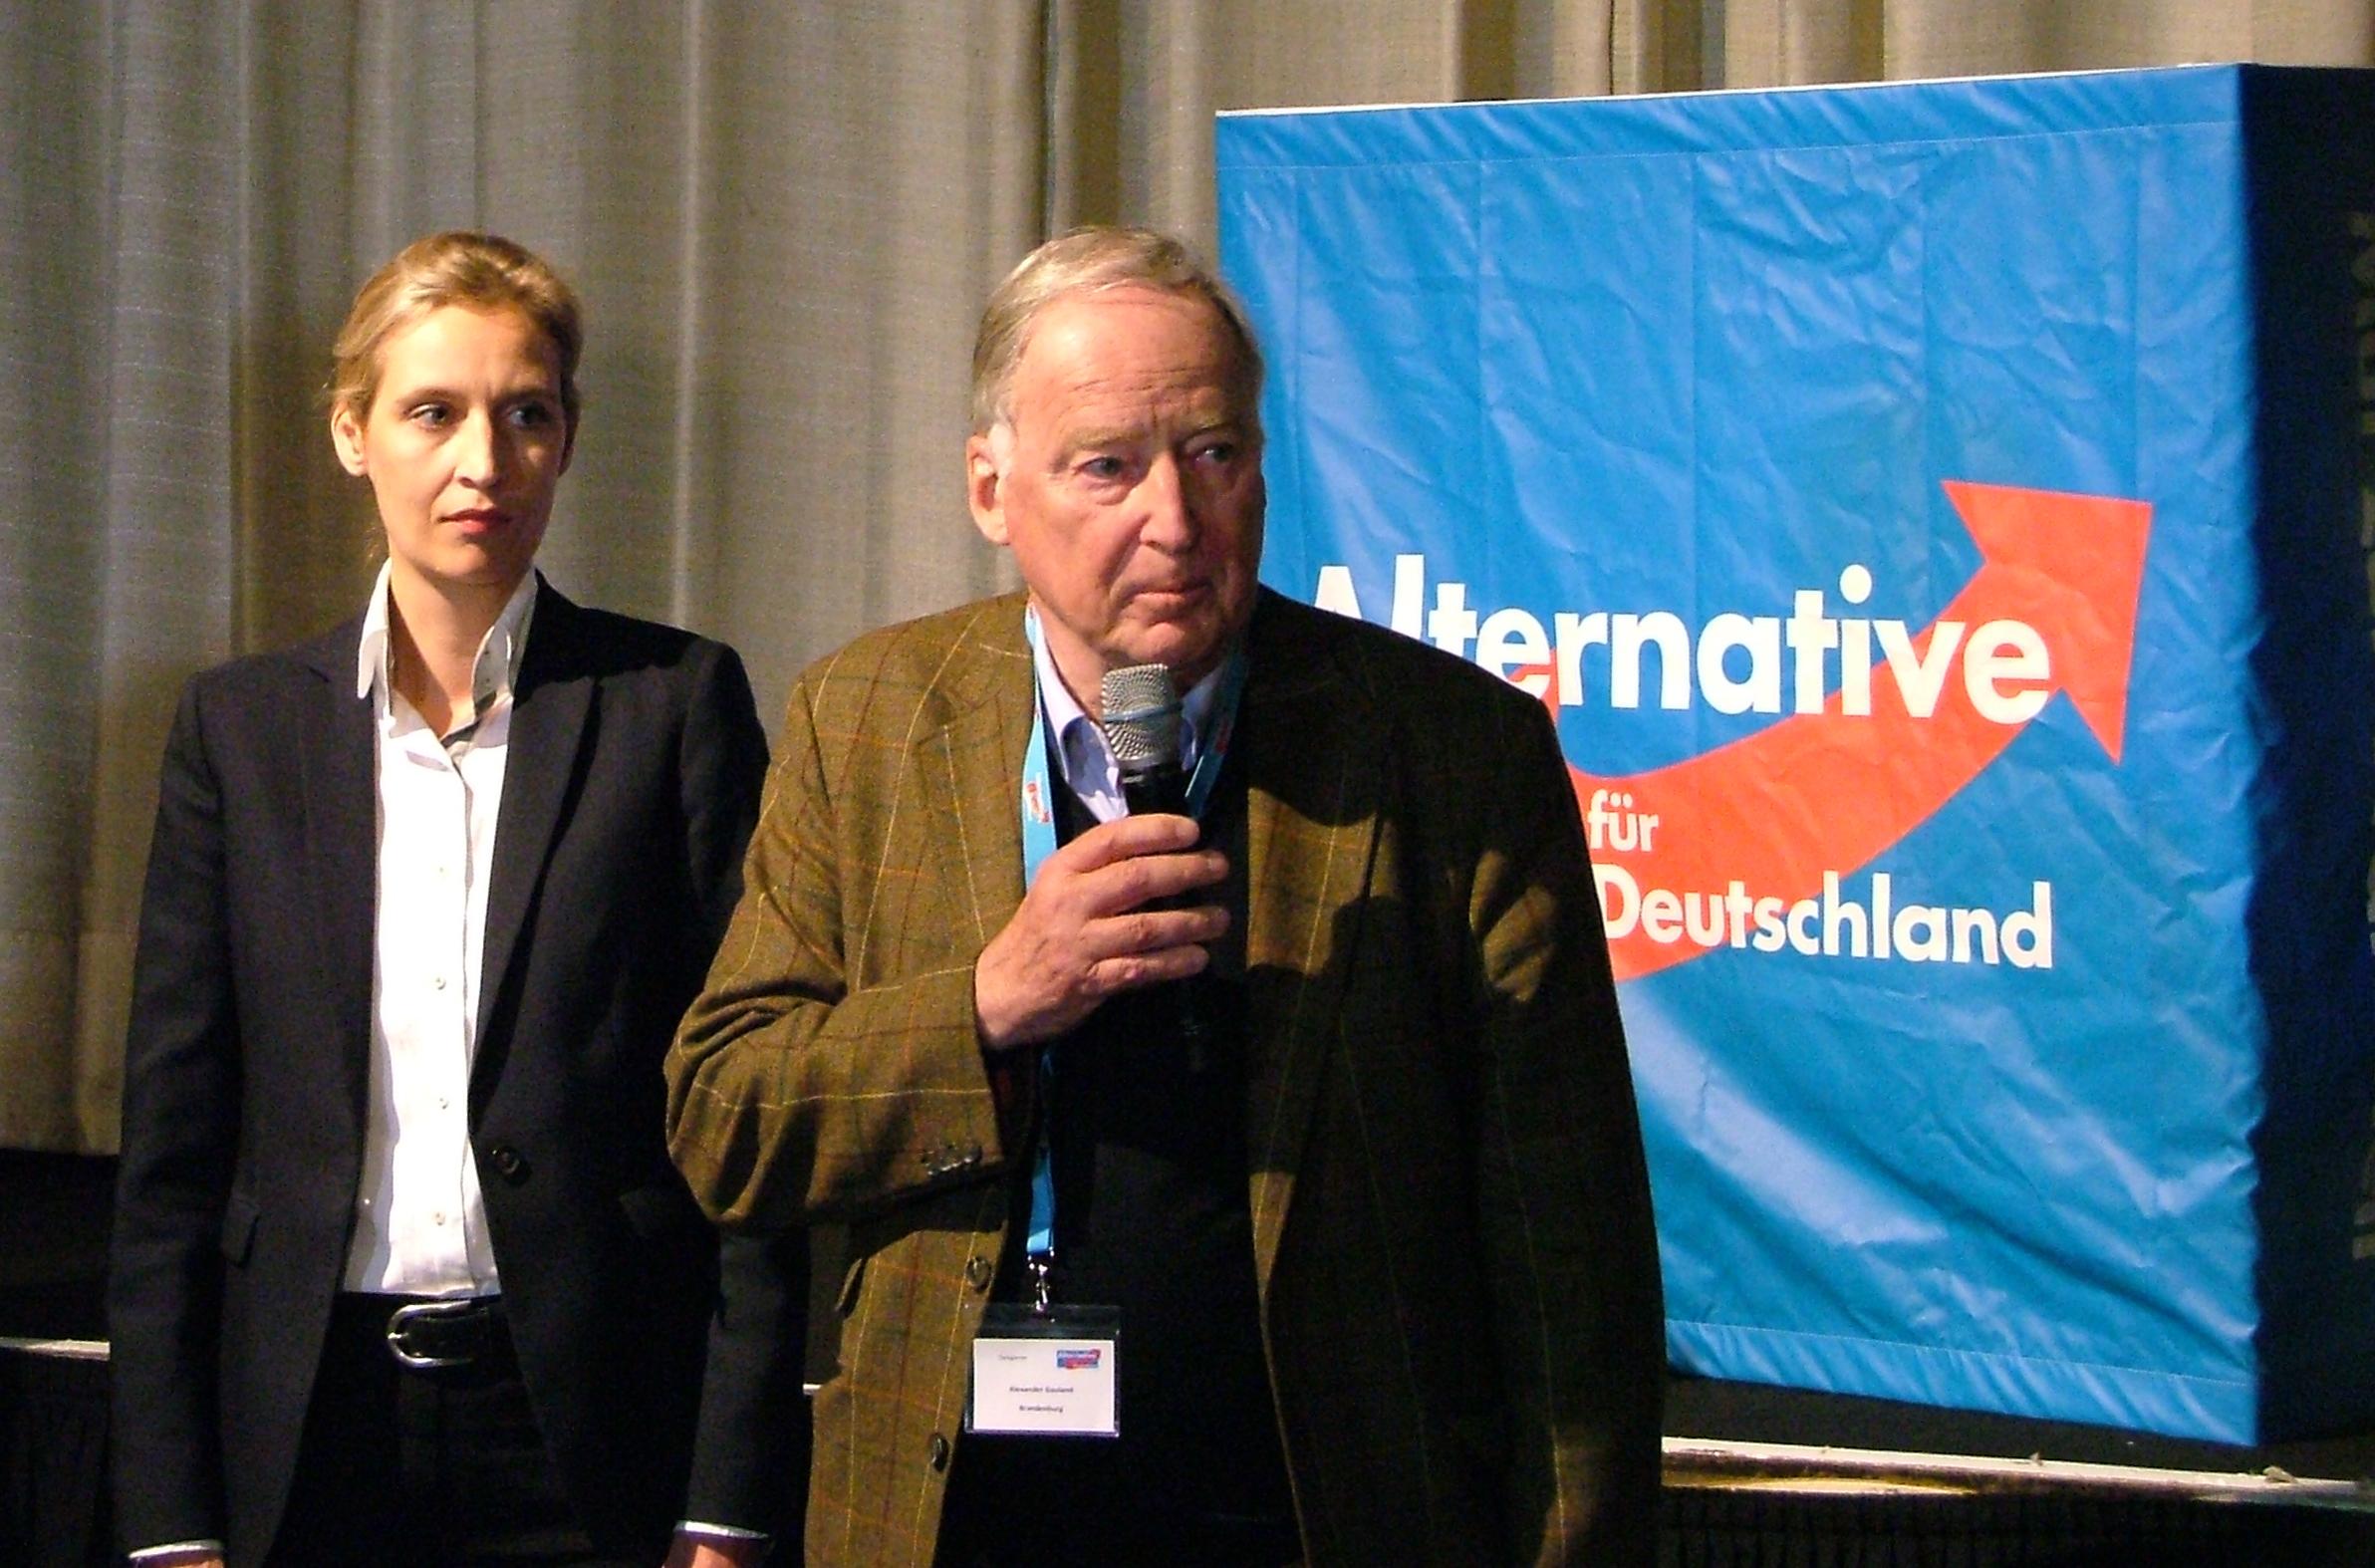 https://upload.wikimedia.org/wikipedia/commons/e/ee/2017-04-23_AfD_Bundesparteitag_in_K%C3%B6ln_-68.jpg